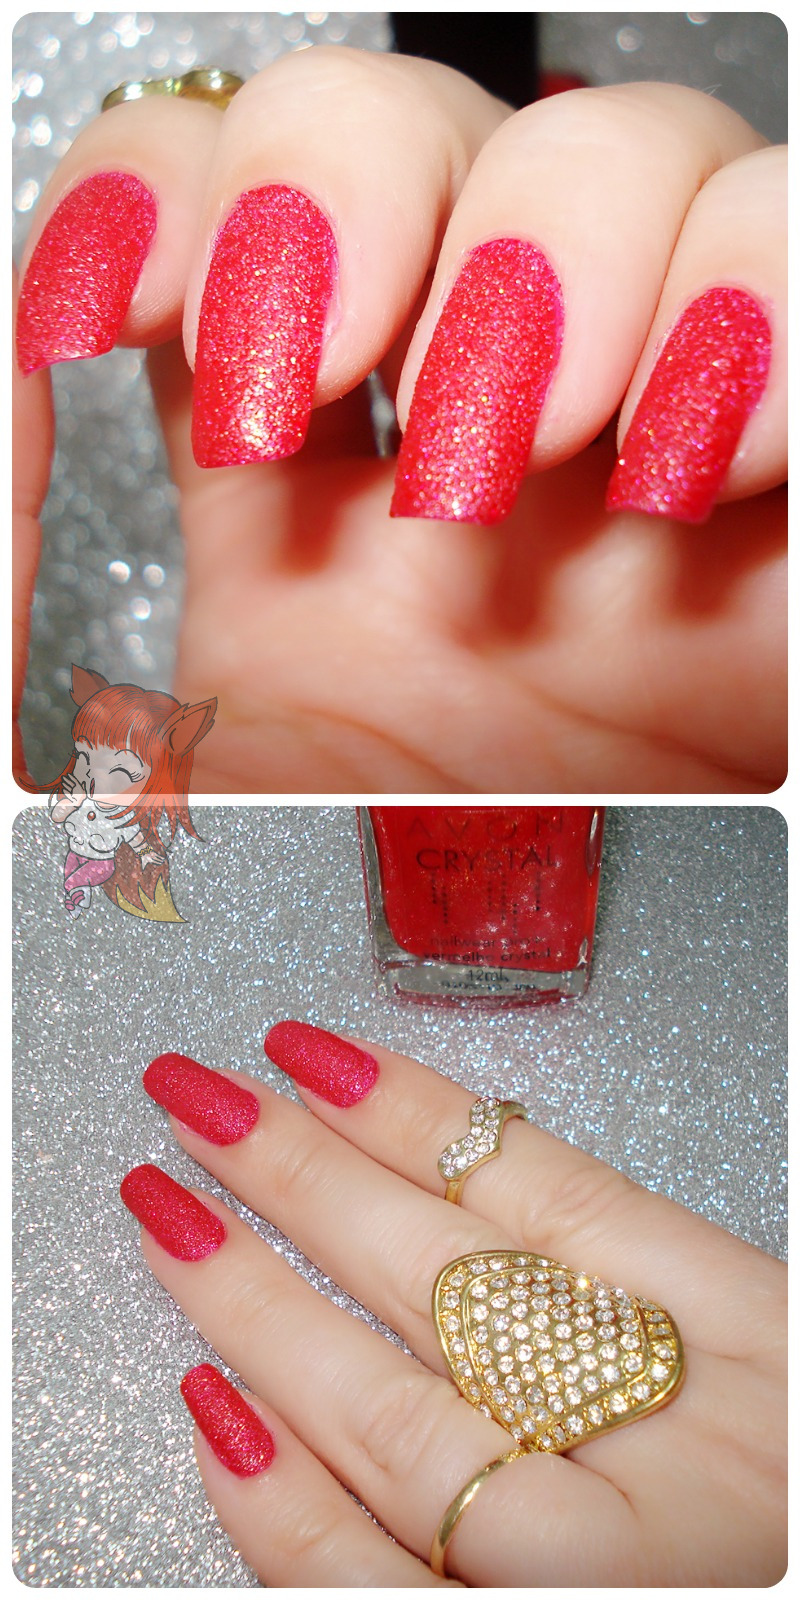 Esmalte Avon :: Vermelho Crystal - Resenha